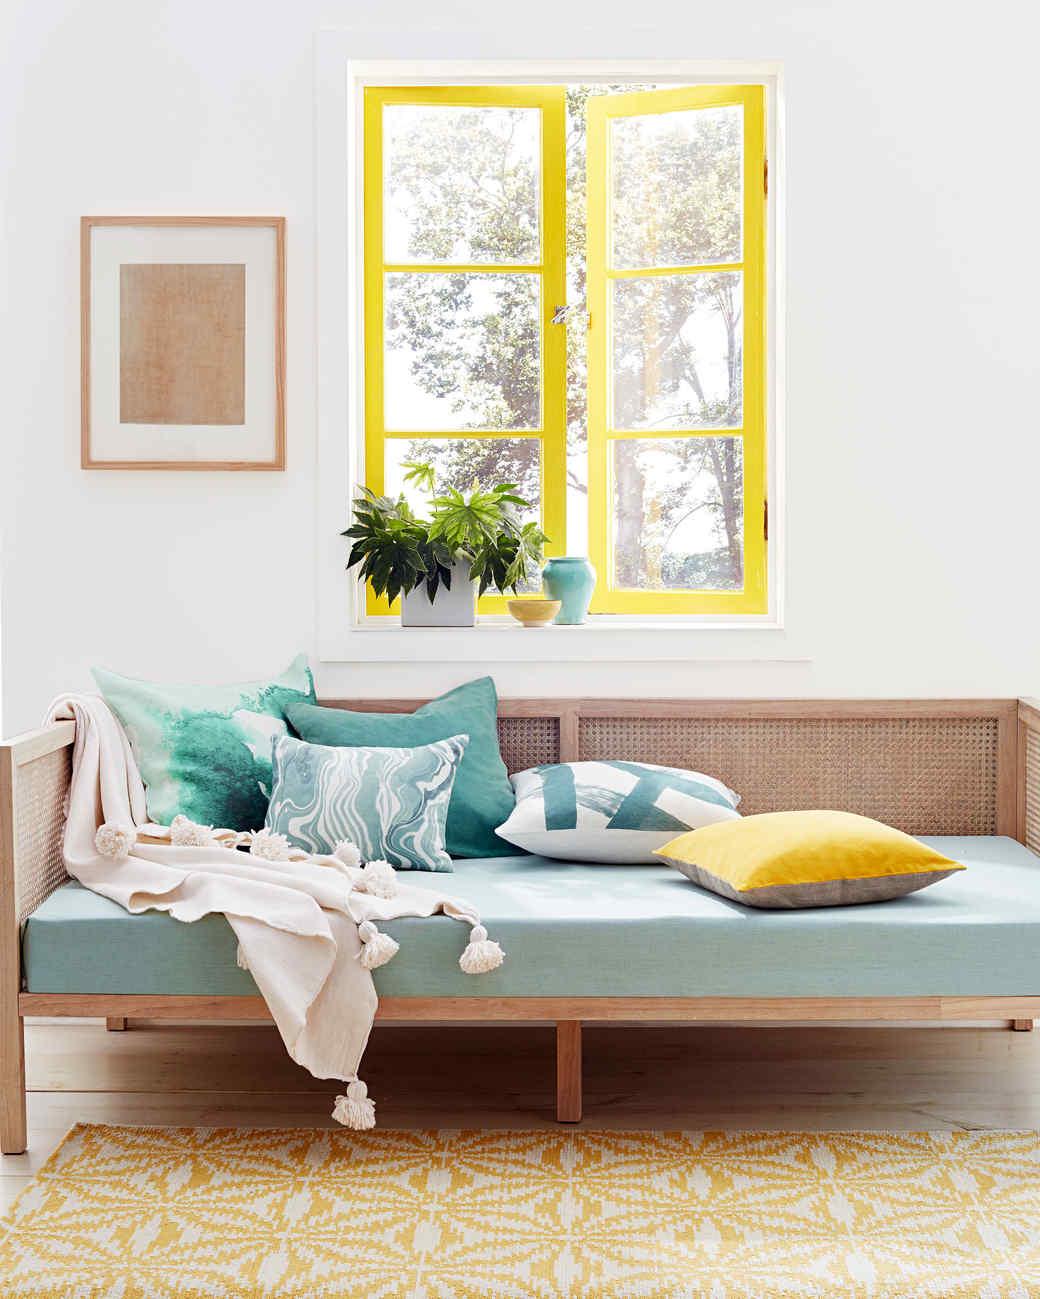 Living Room Sofa Color Yellow Celadon Decor Blue Green